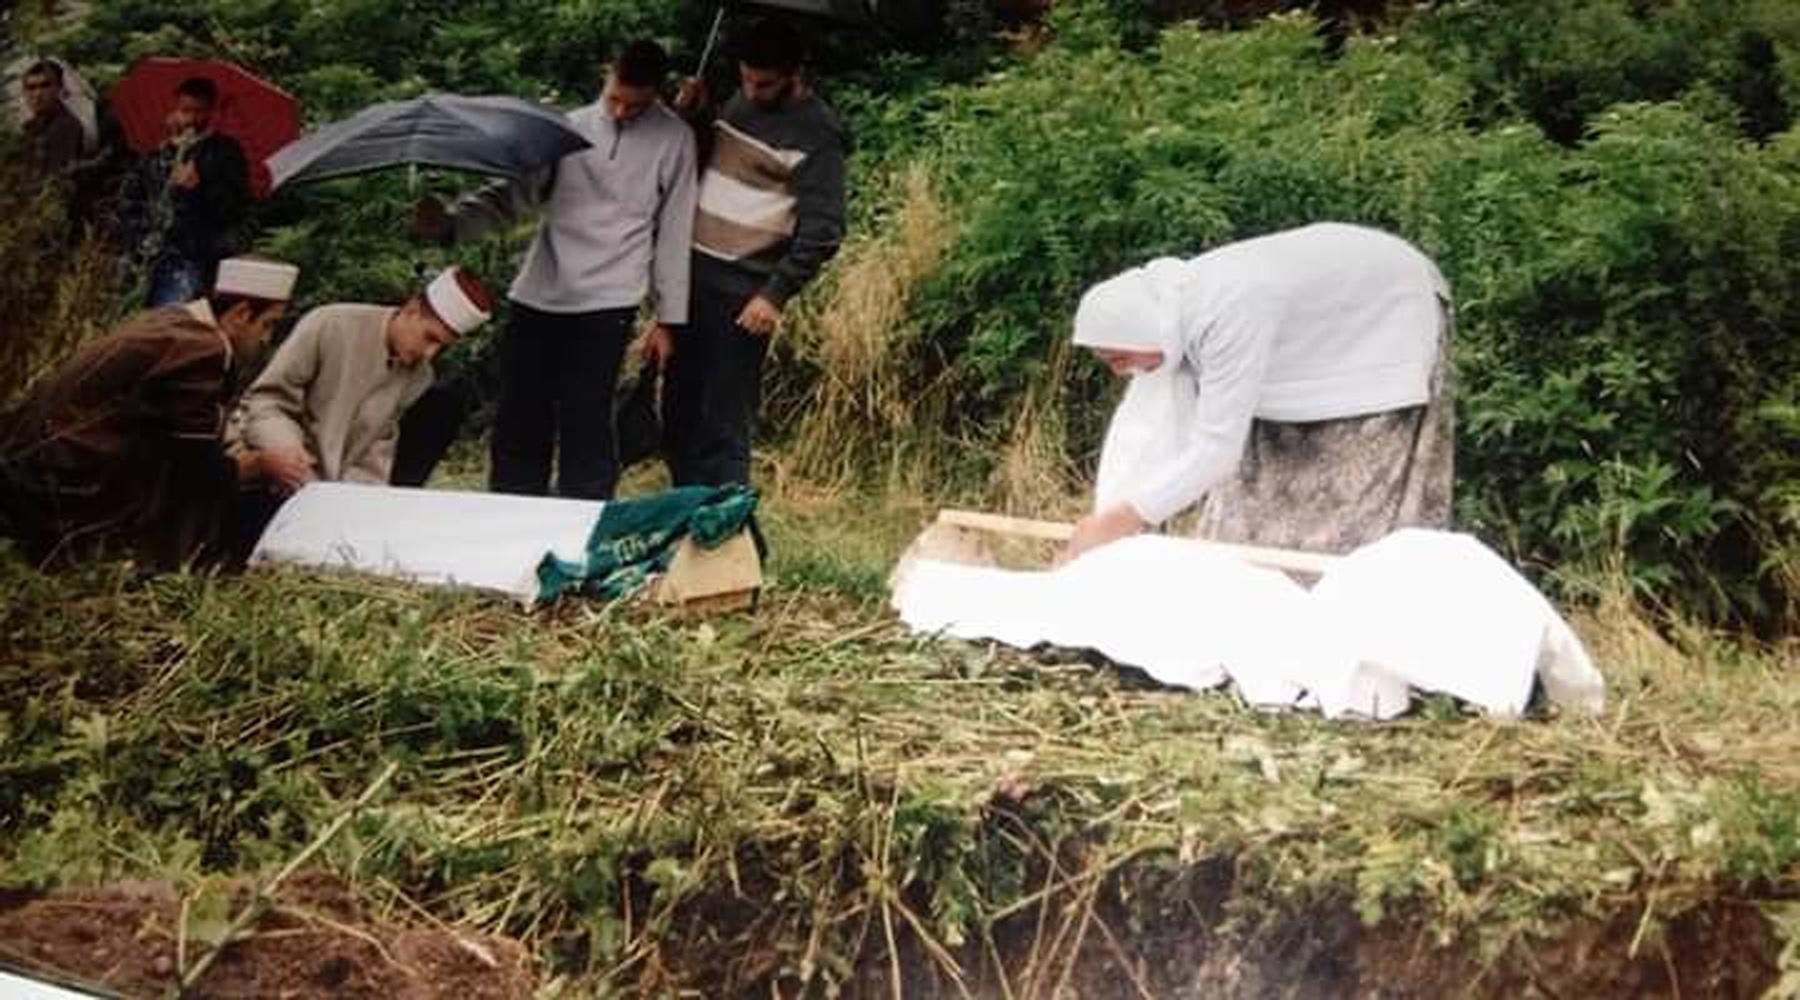 Zločin u Kukurovićima: Zločinci bez osude, žrtve bez pravde